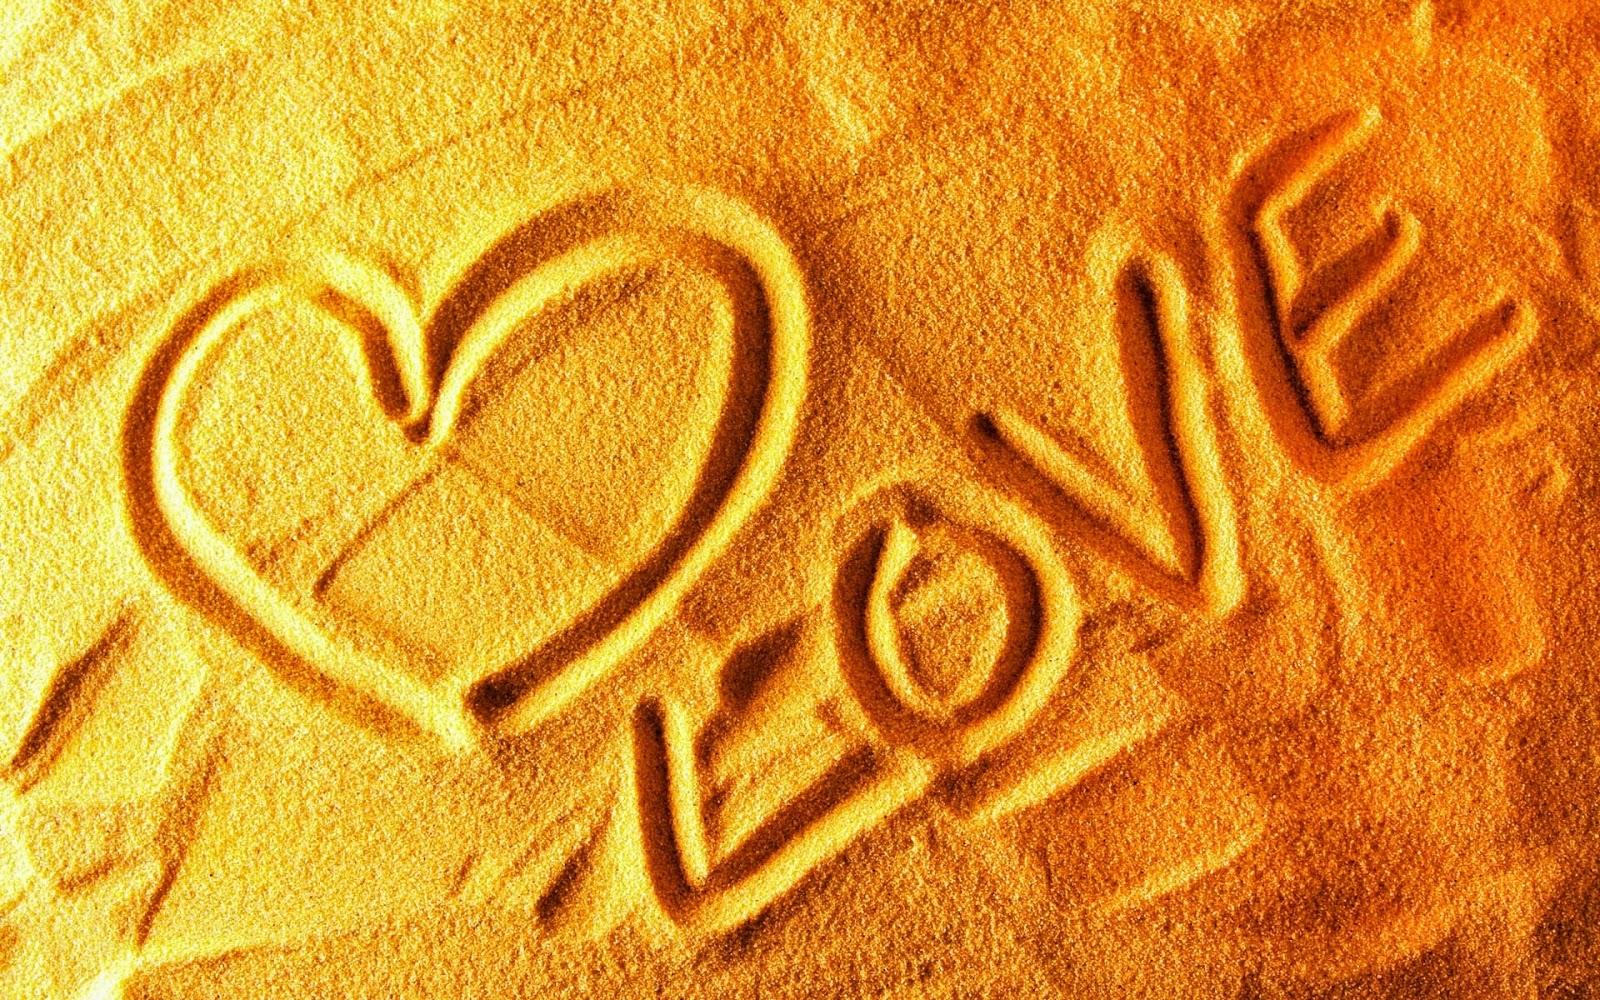 Love wallpapers hd wallpapers hd - M r love wallpaper ...